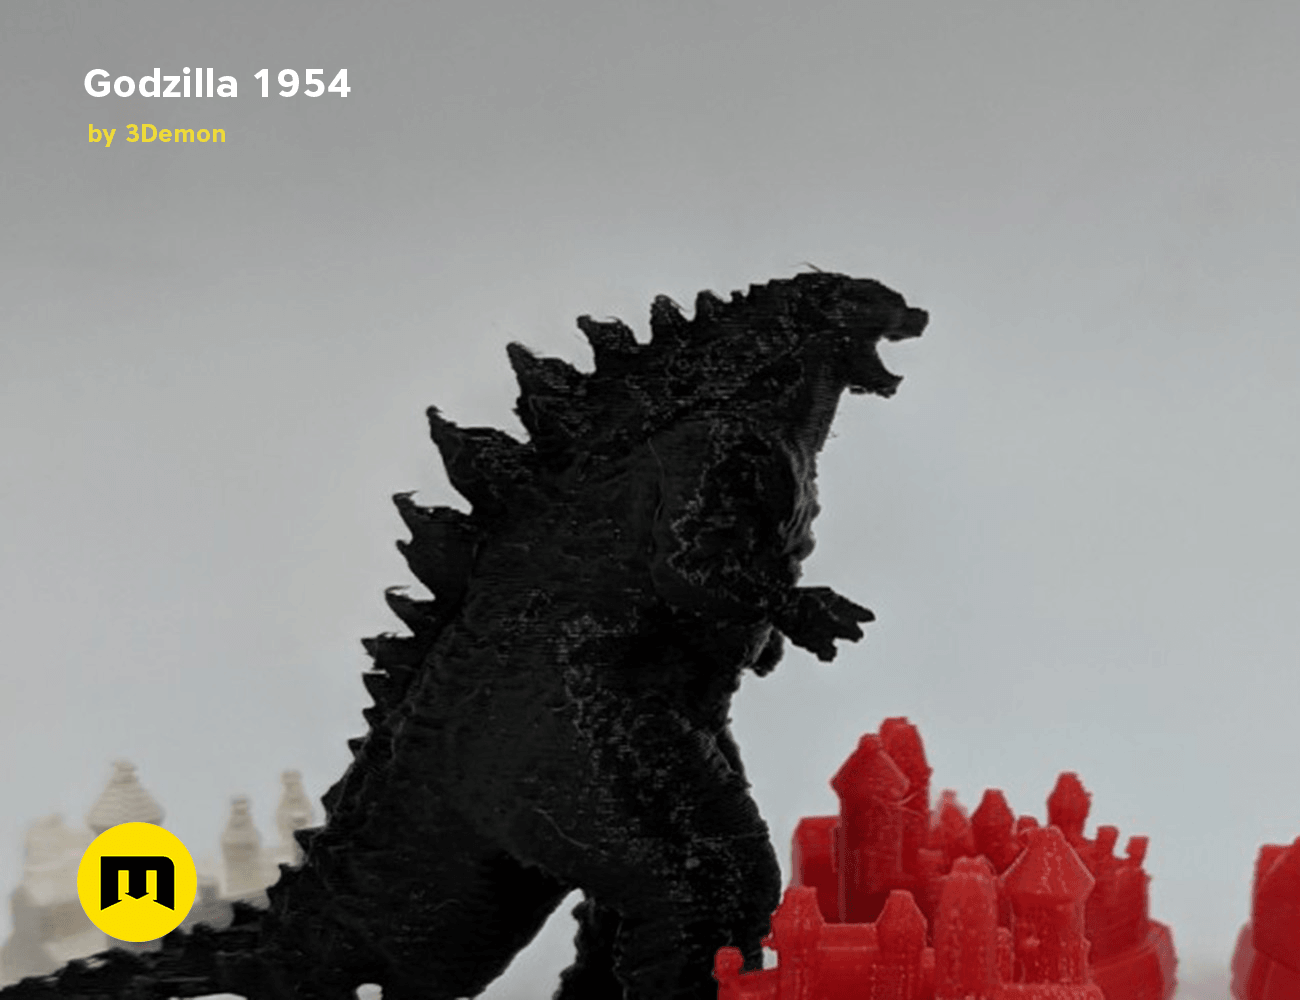 IMG_20190301_100205.png Download free OBJ file Godzilla 1954 figure and bottle opener • 3D printer model, 3D-mon